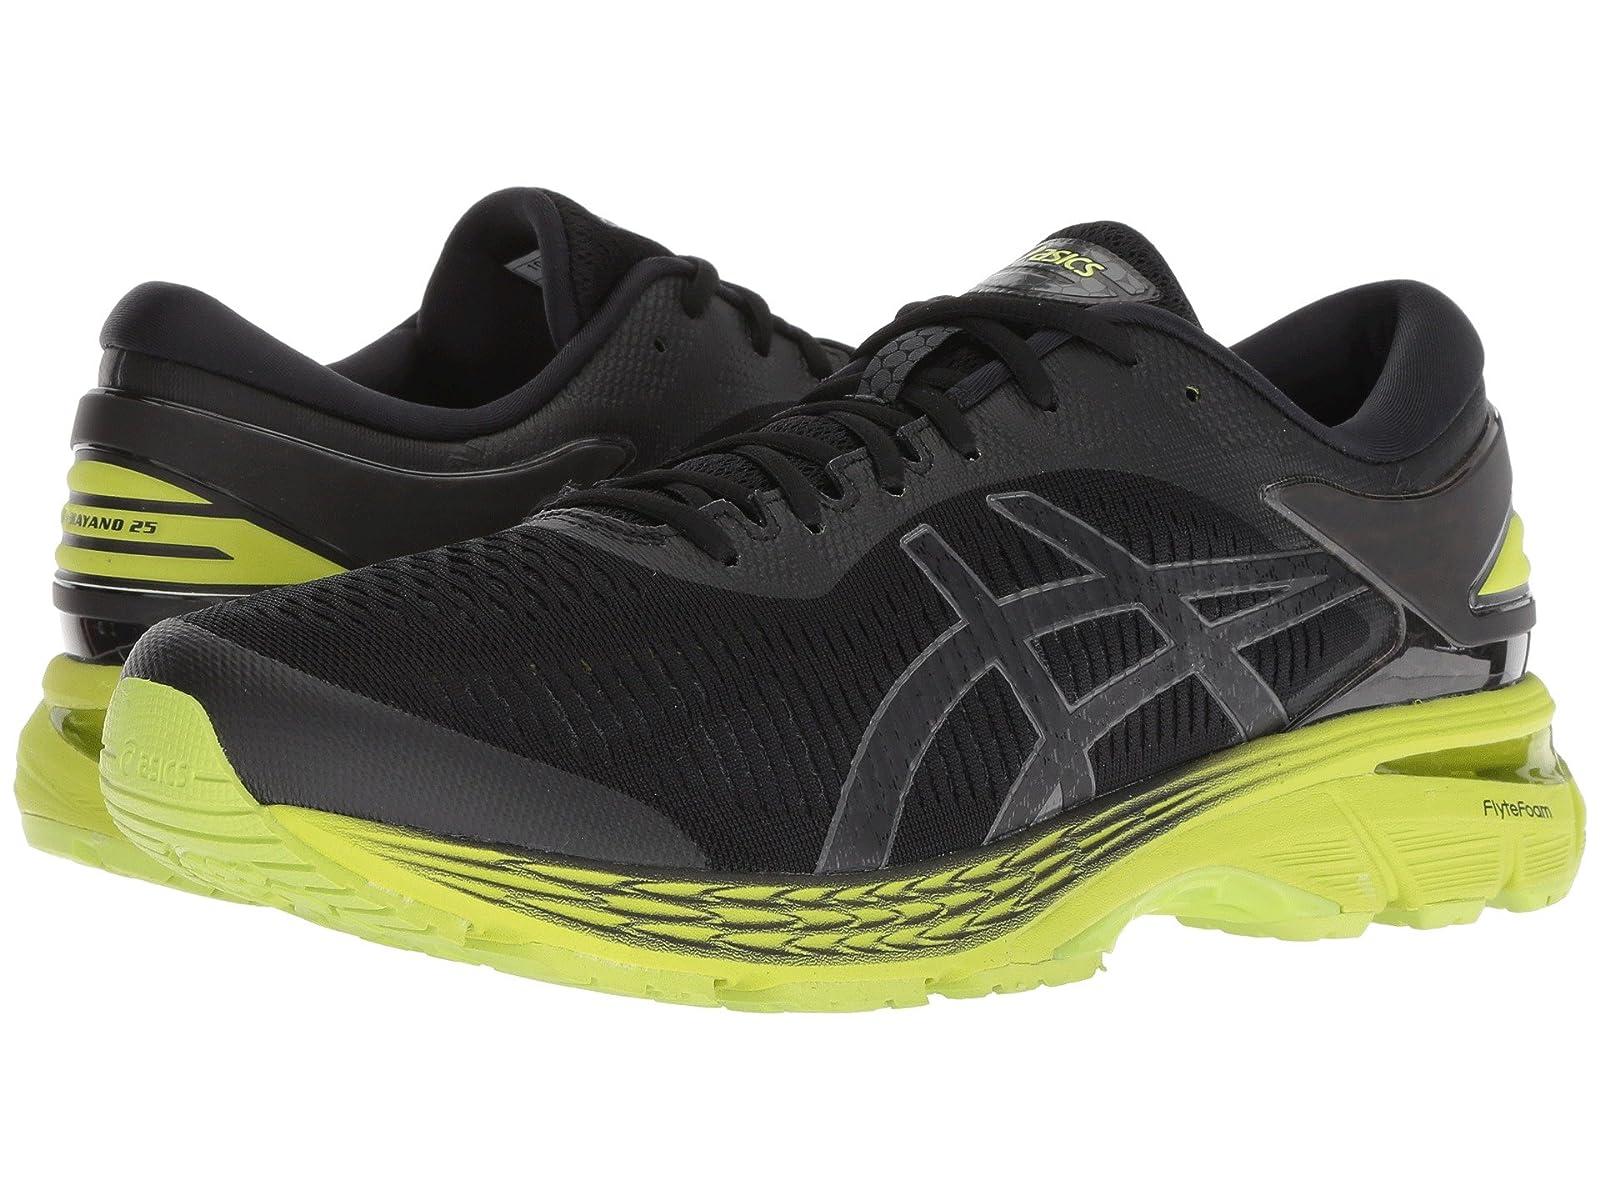 ASICS GEL-Kayano® 25Atmospheric grades have affordable shoes